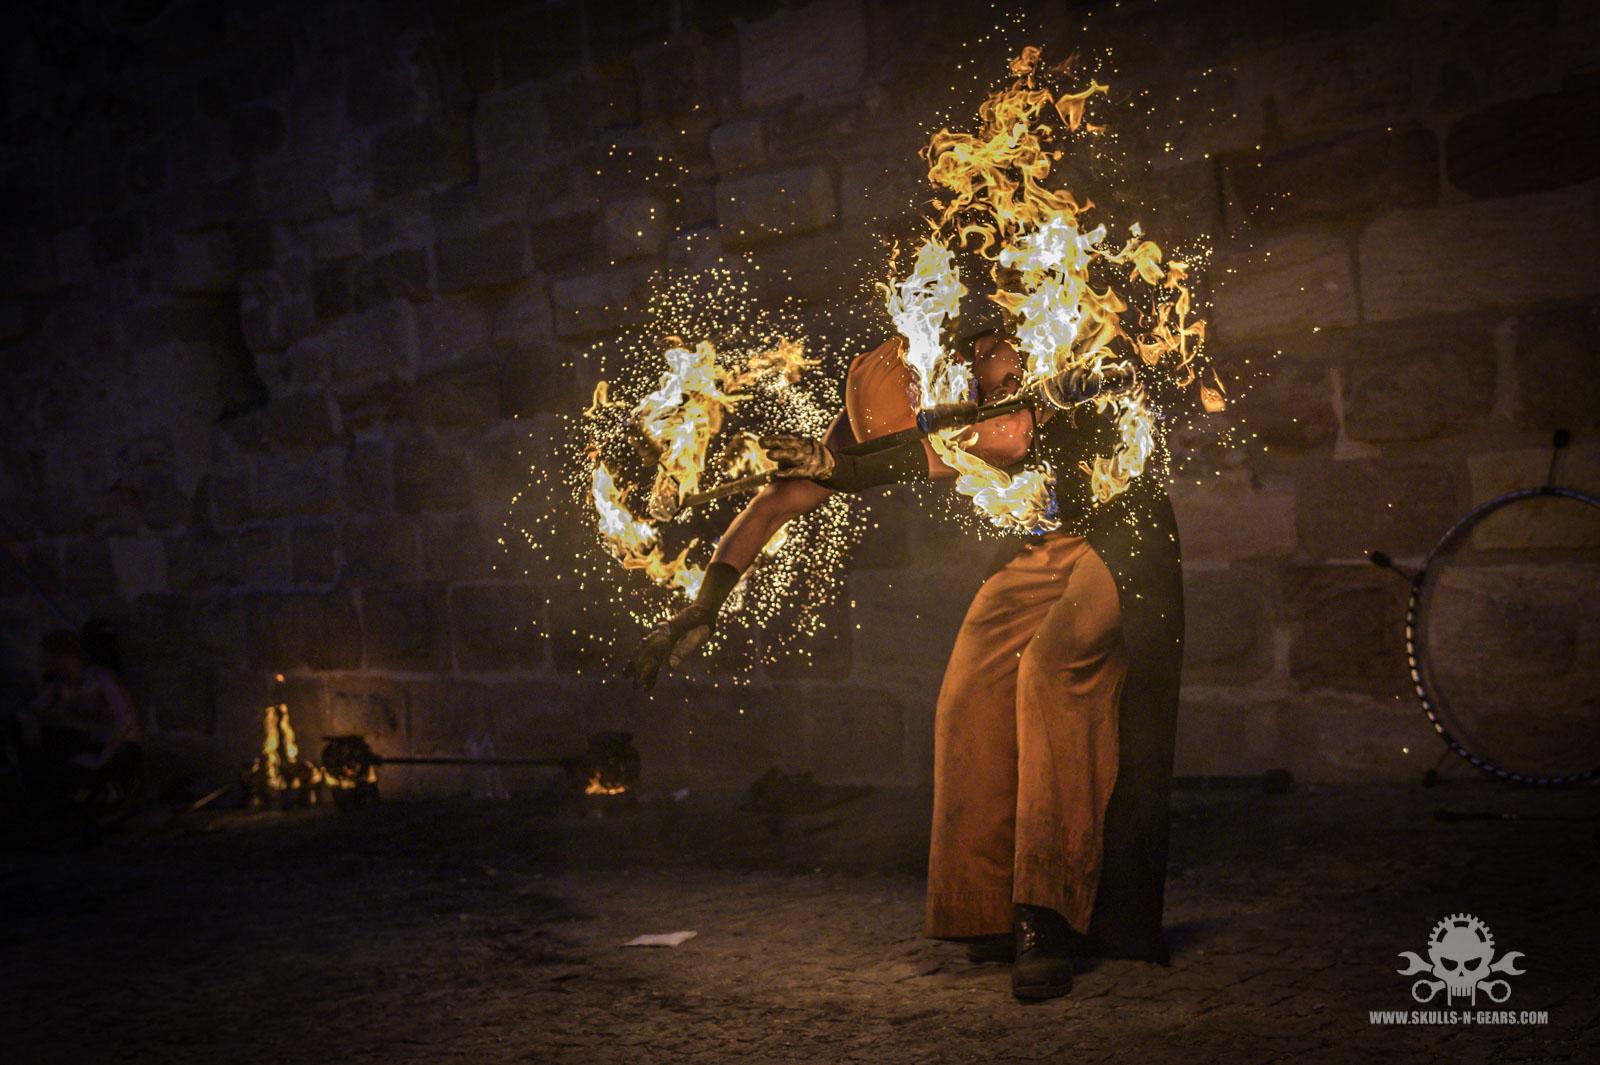 Feuertanz Festival 2019 - Feuershow-1258